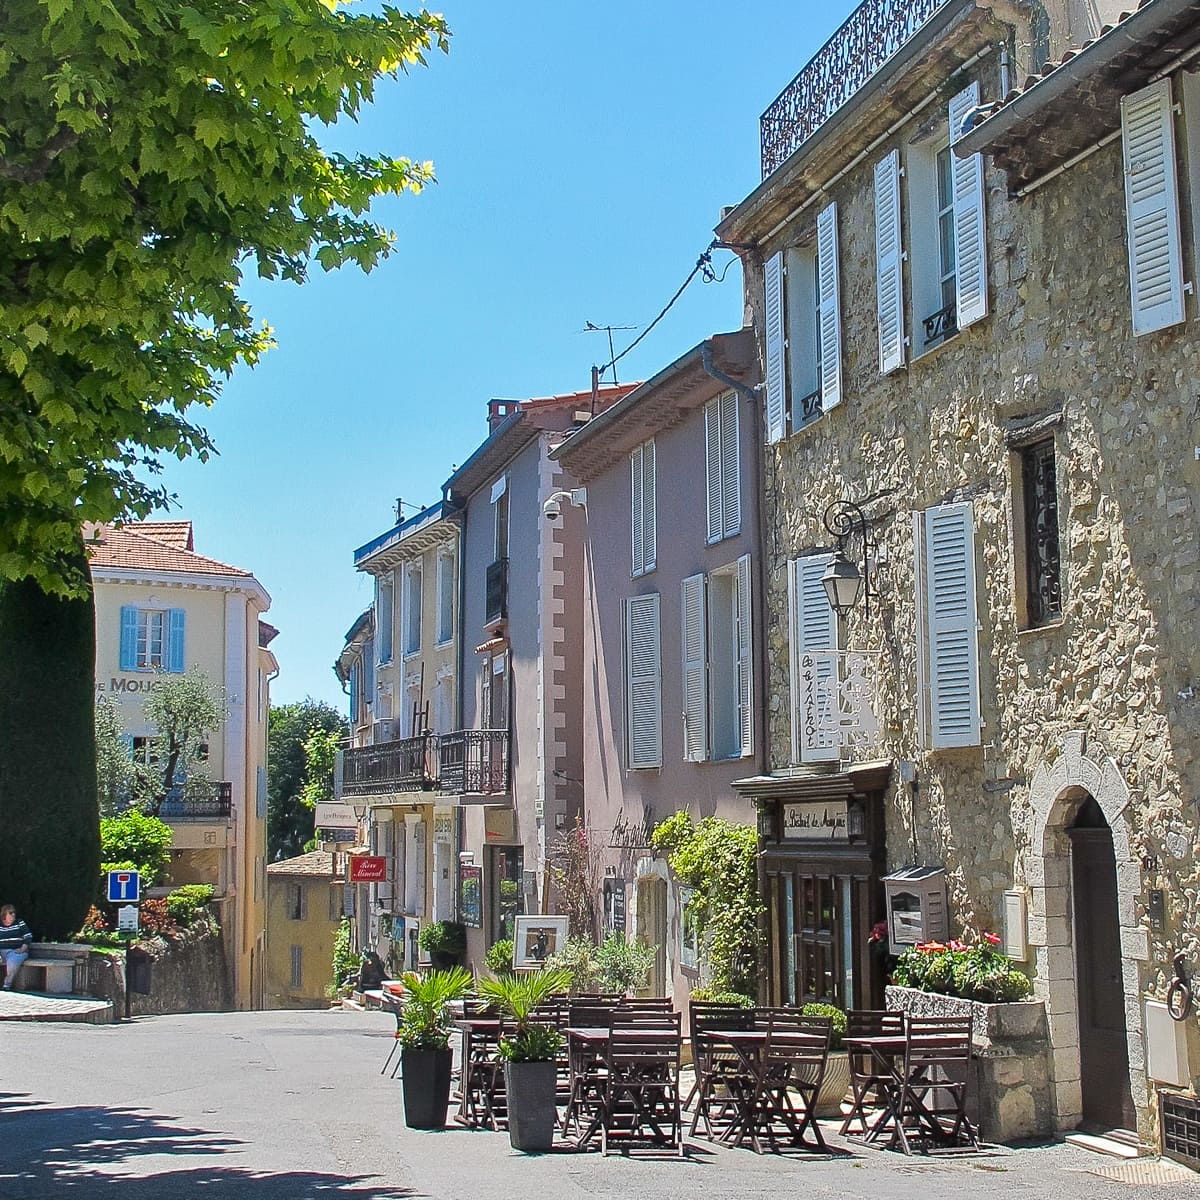 Summer Vacation   South of France - designthusiasm.com